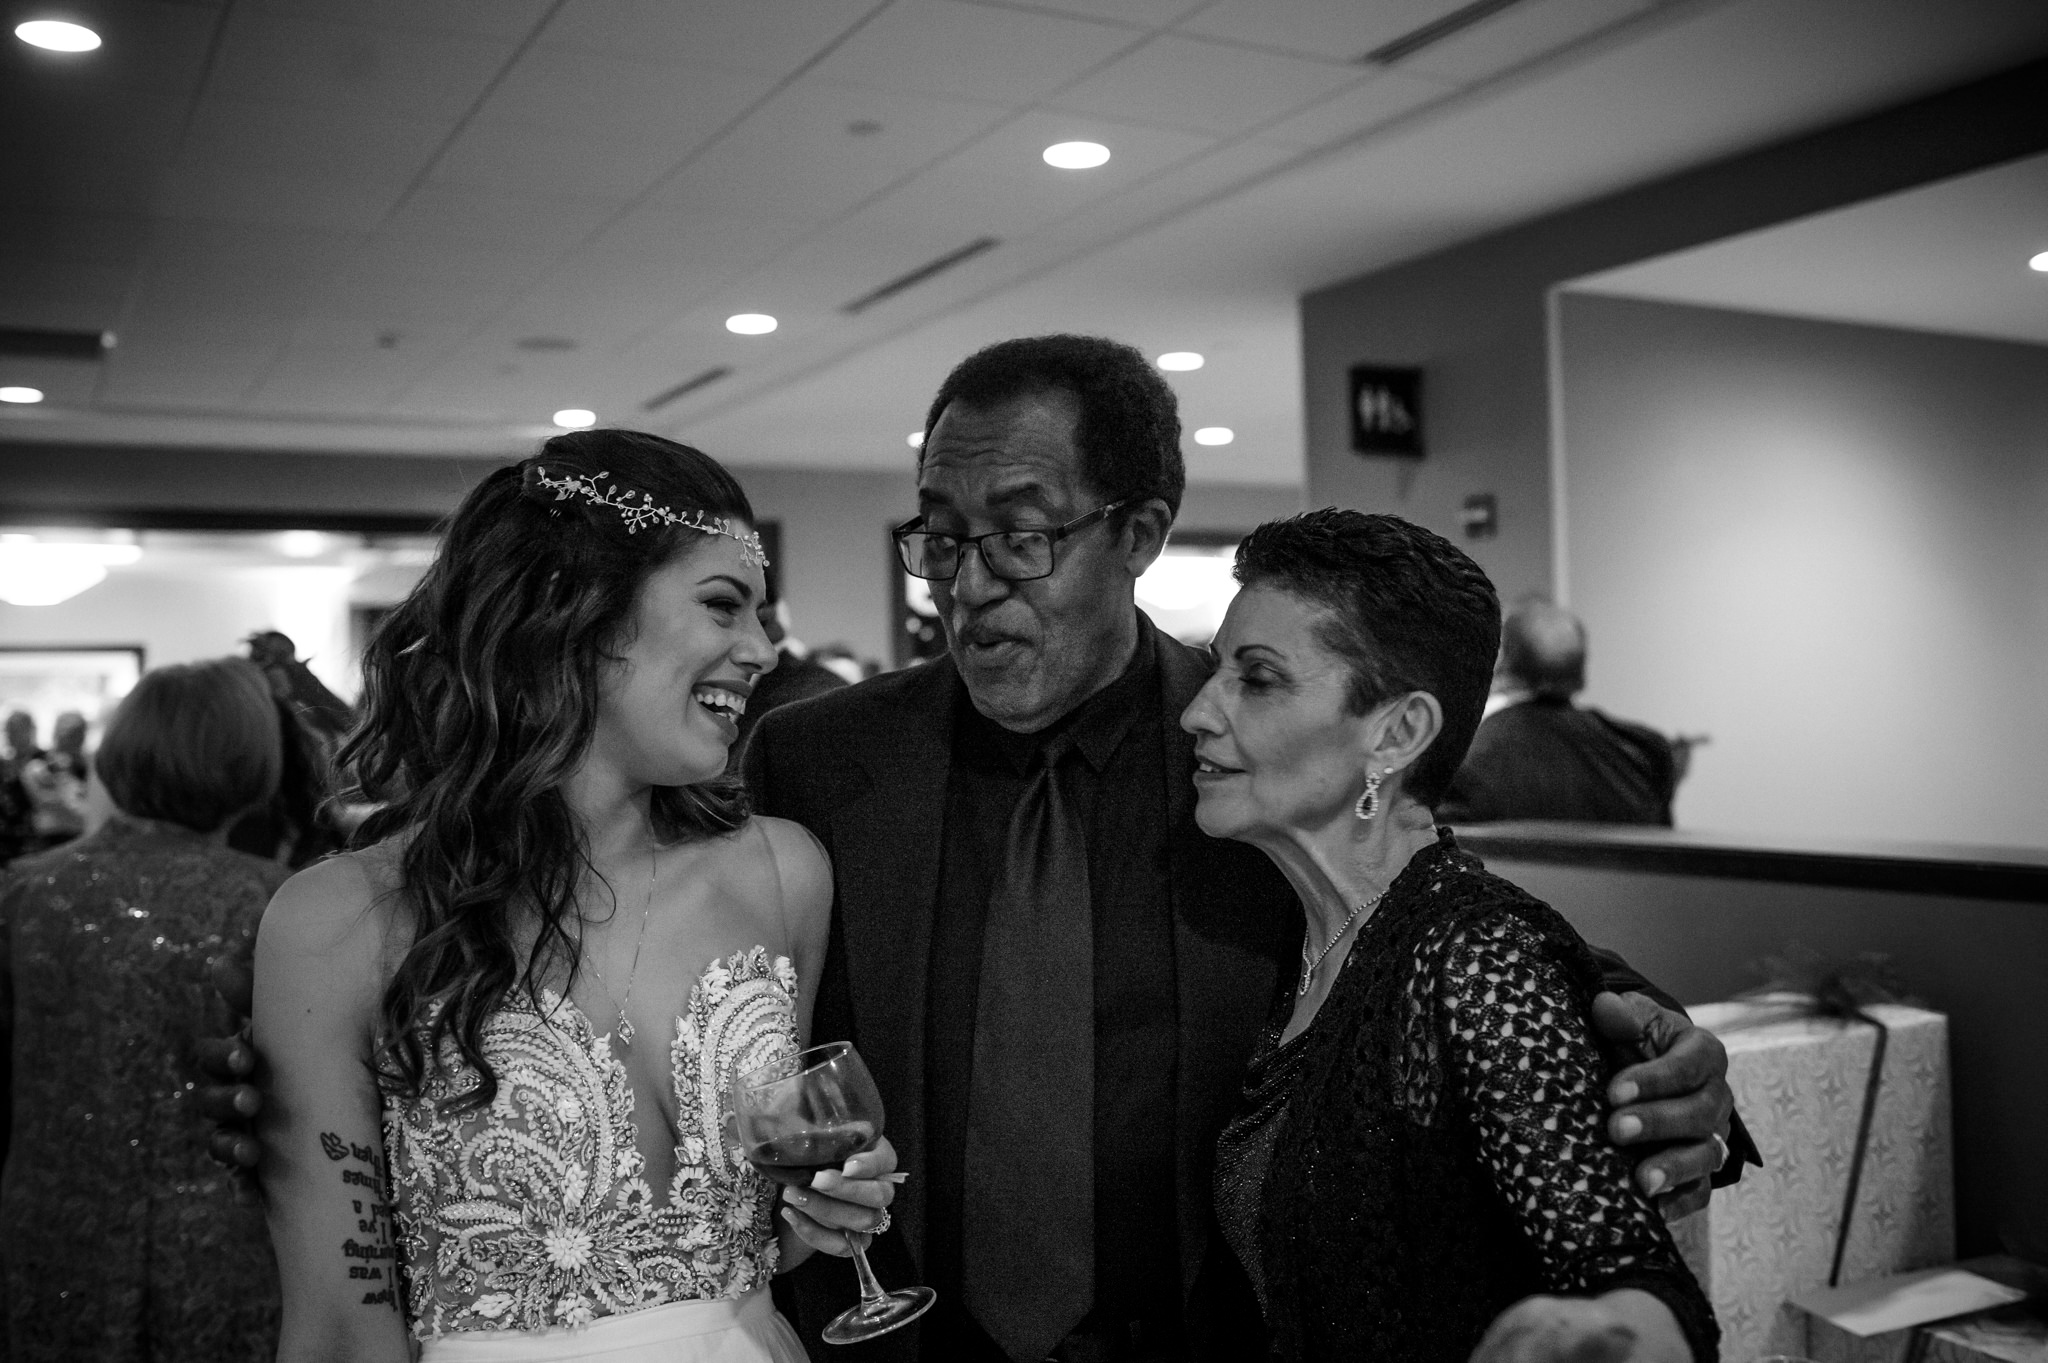 HILTON-OMAHA-WEDDING-PHOTOGRAPHER-JM-STUDIOS-OMAHA-LIV-BRICE-031.jpg